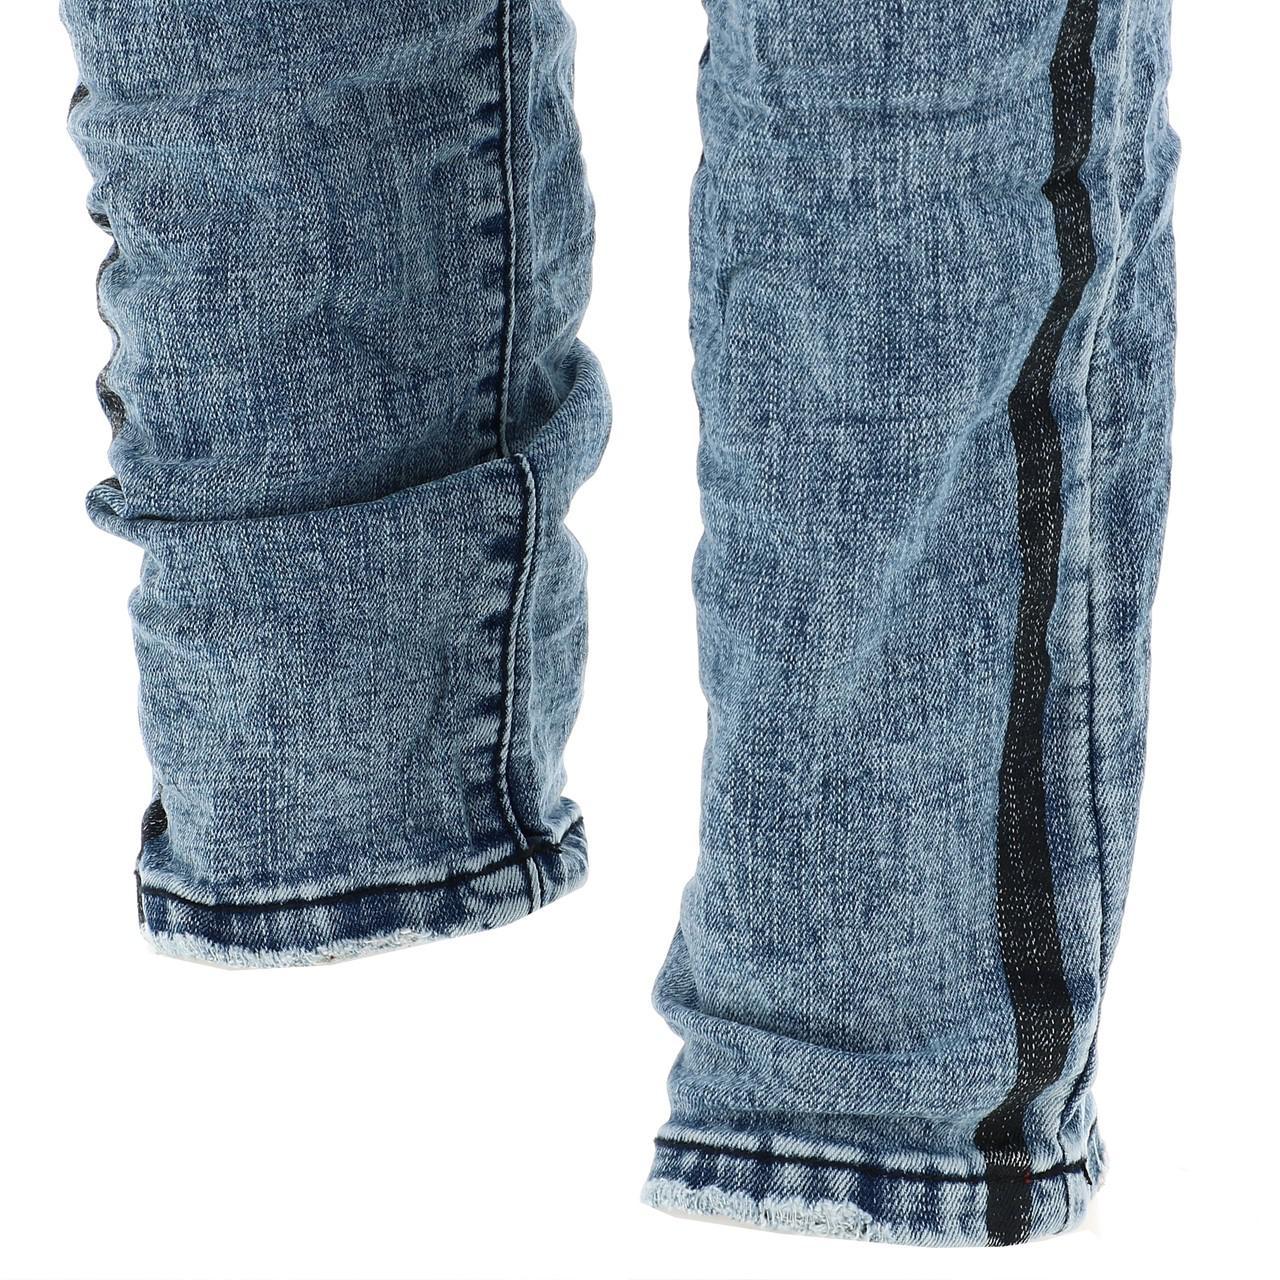 Jeans-Pants-Slim-Terance-Koll-Oscar-Denim-Jeans-Skinny-Blue-28526-New thumbnail 4